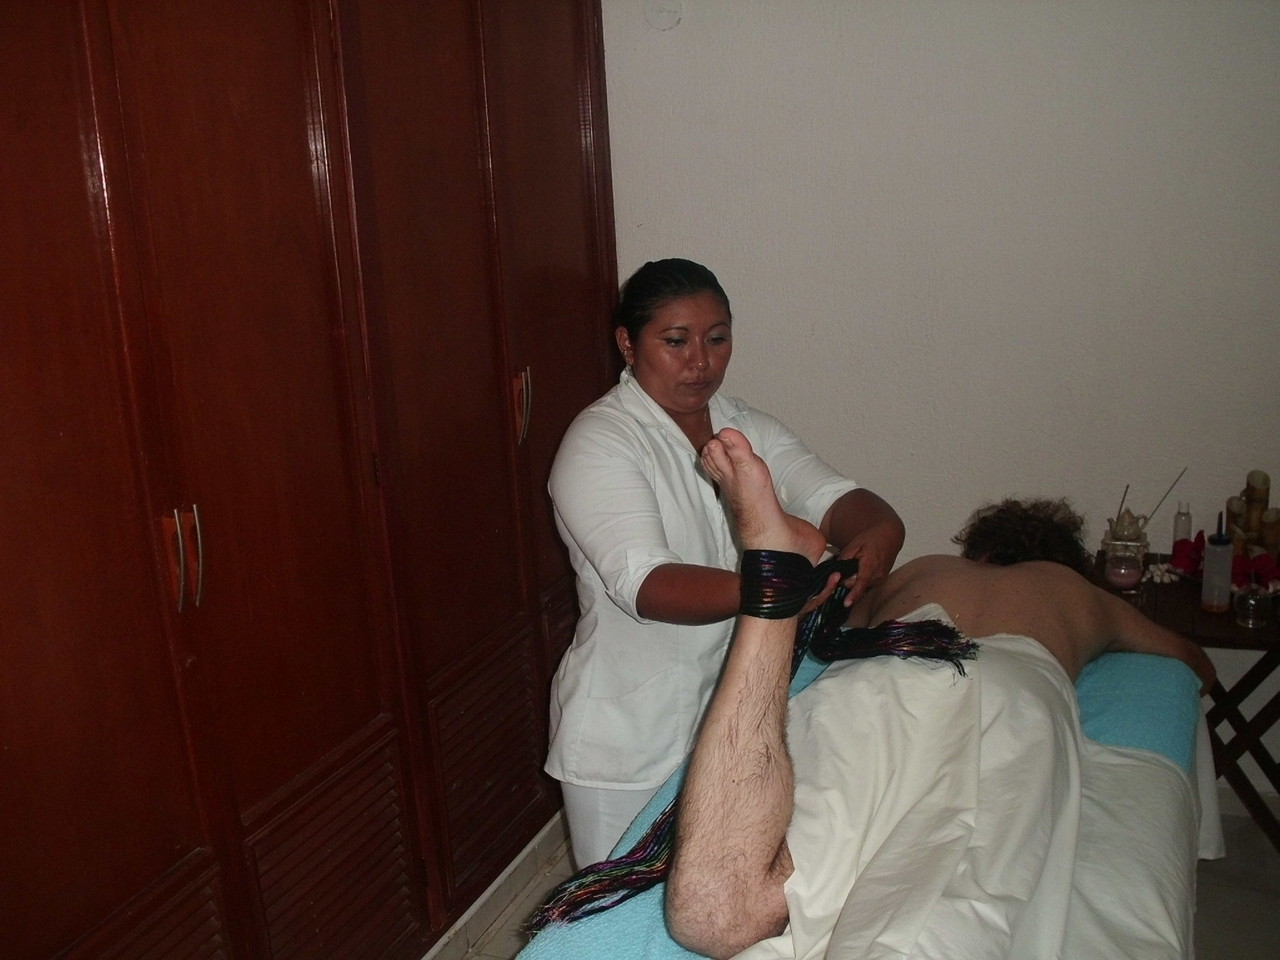 masaje  con lienzos o rebozo maya spa merida